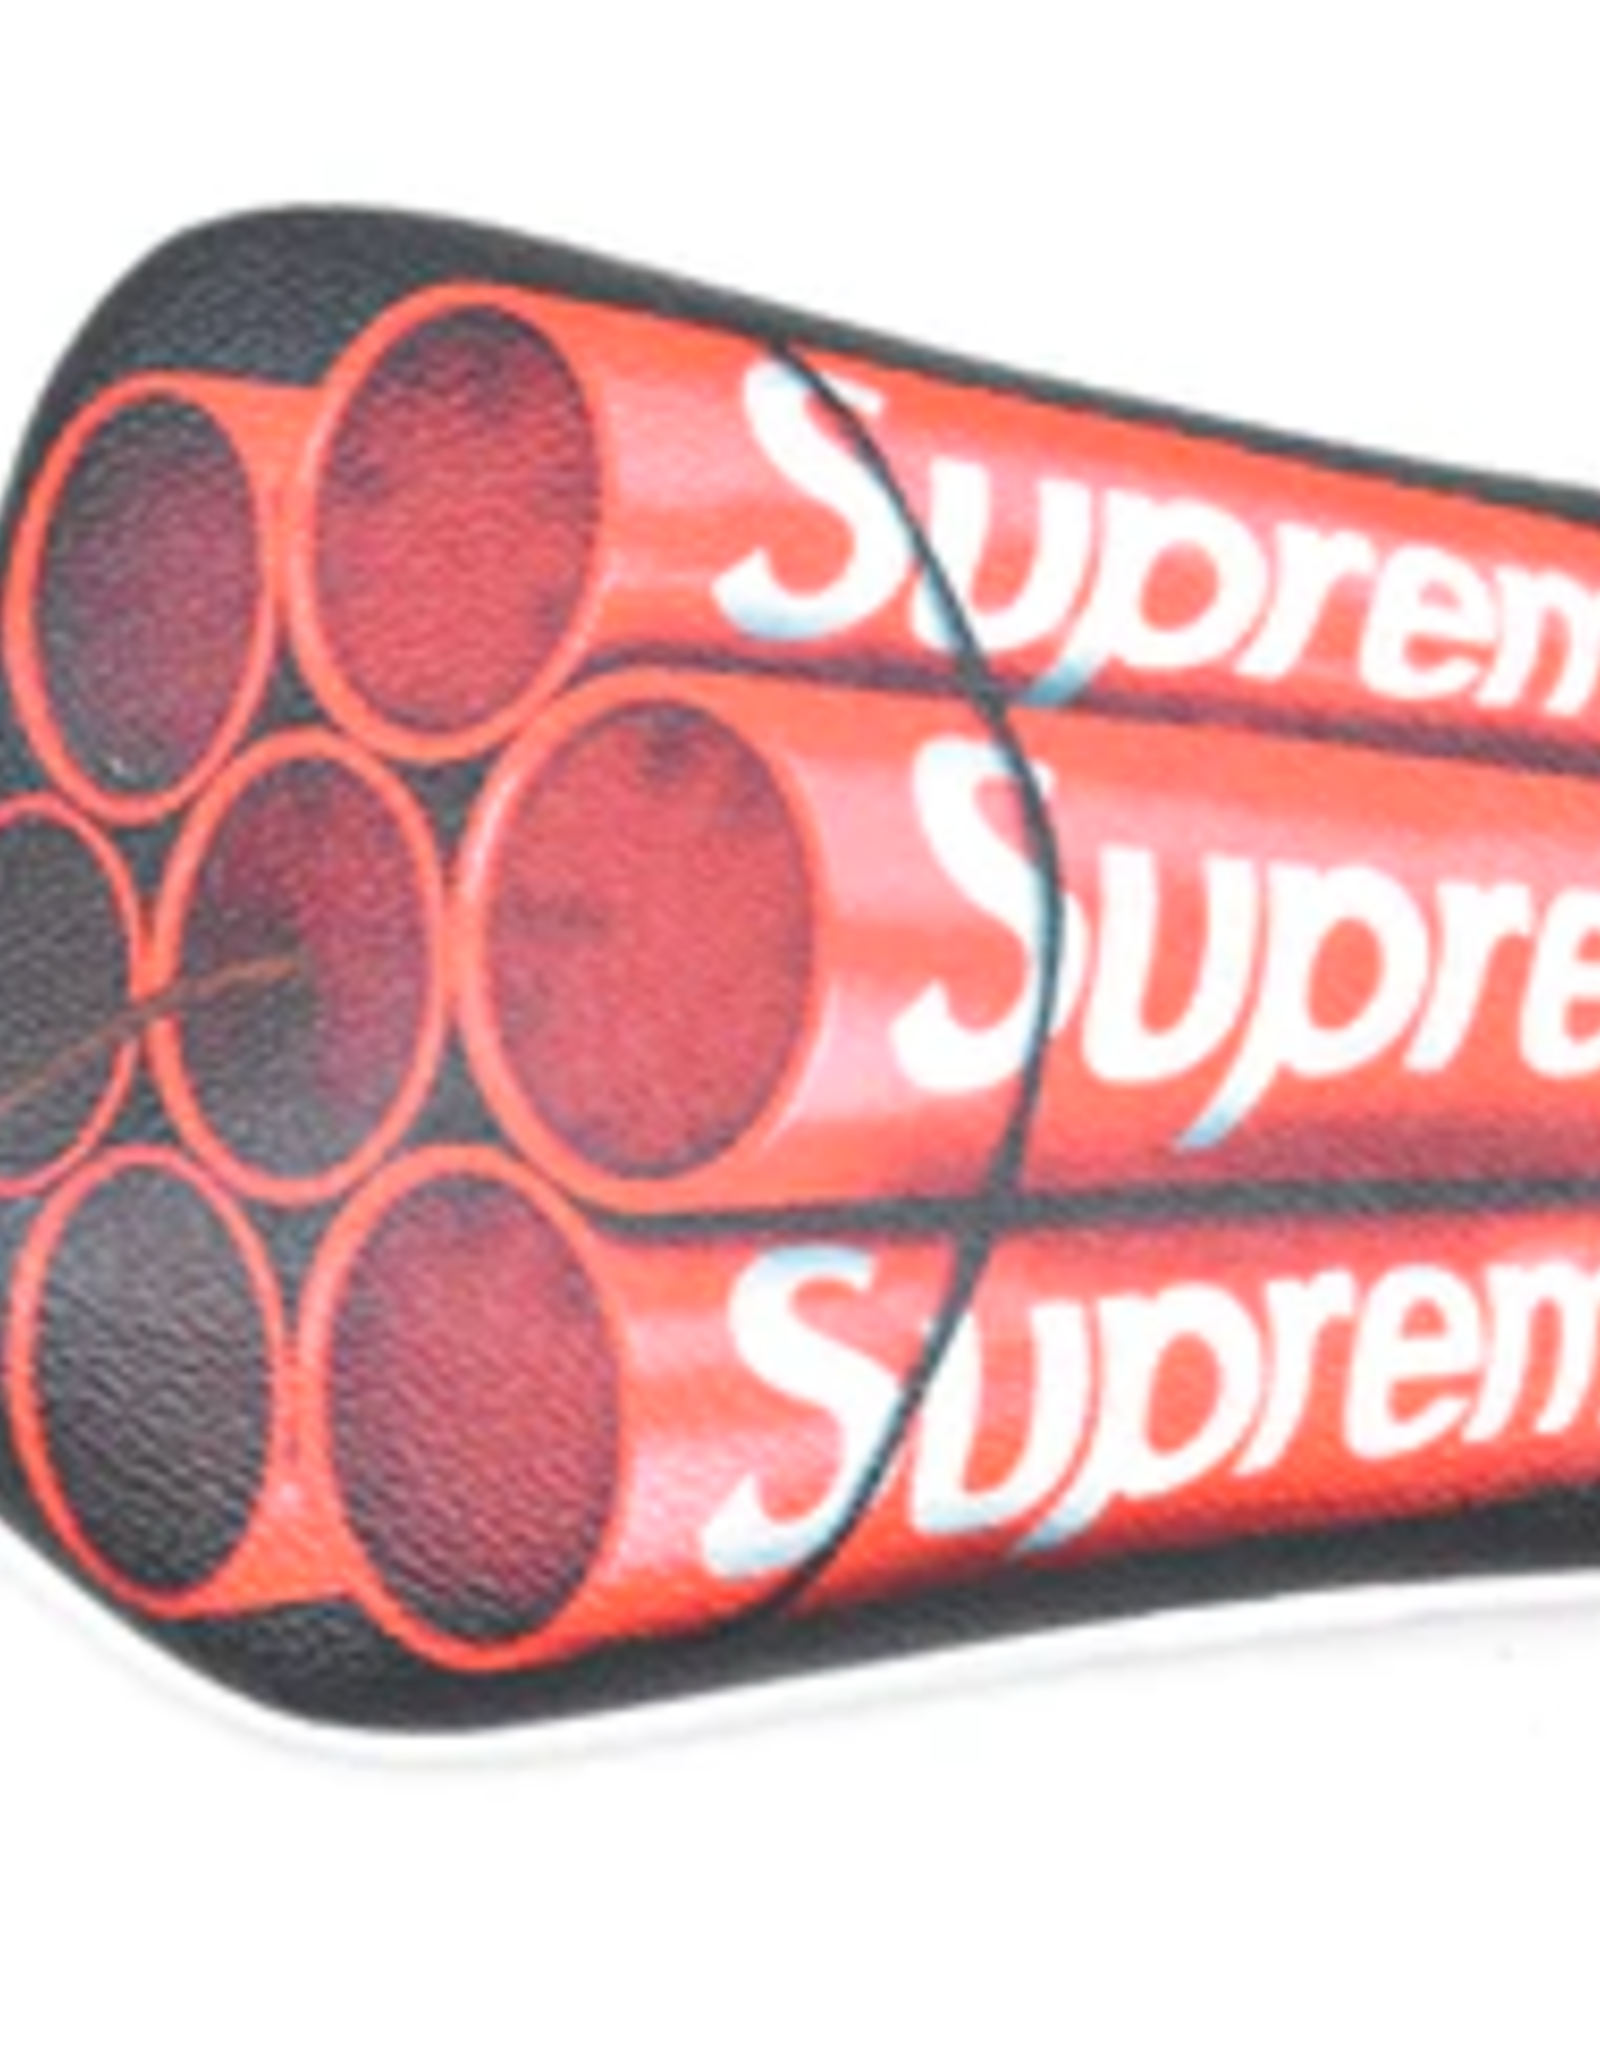 SUPREME Undercover Dynamite Pouch White WORN